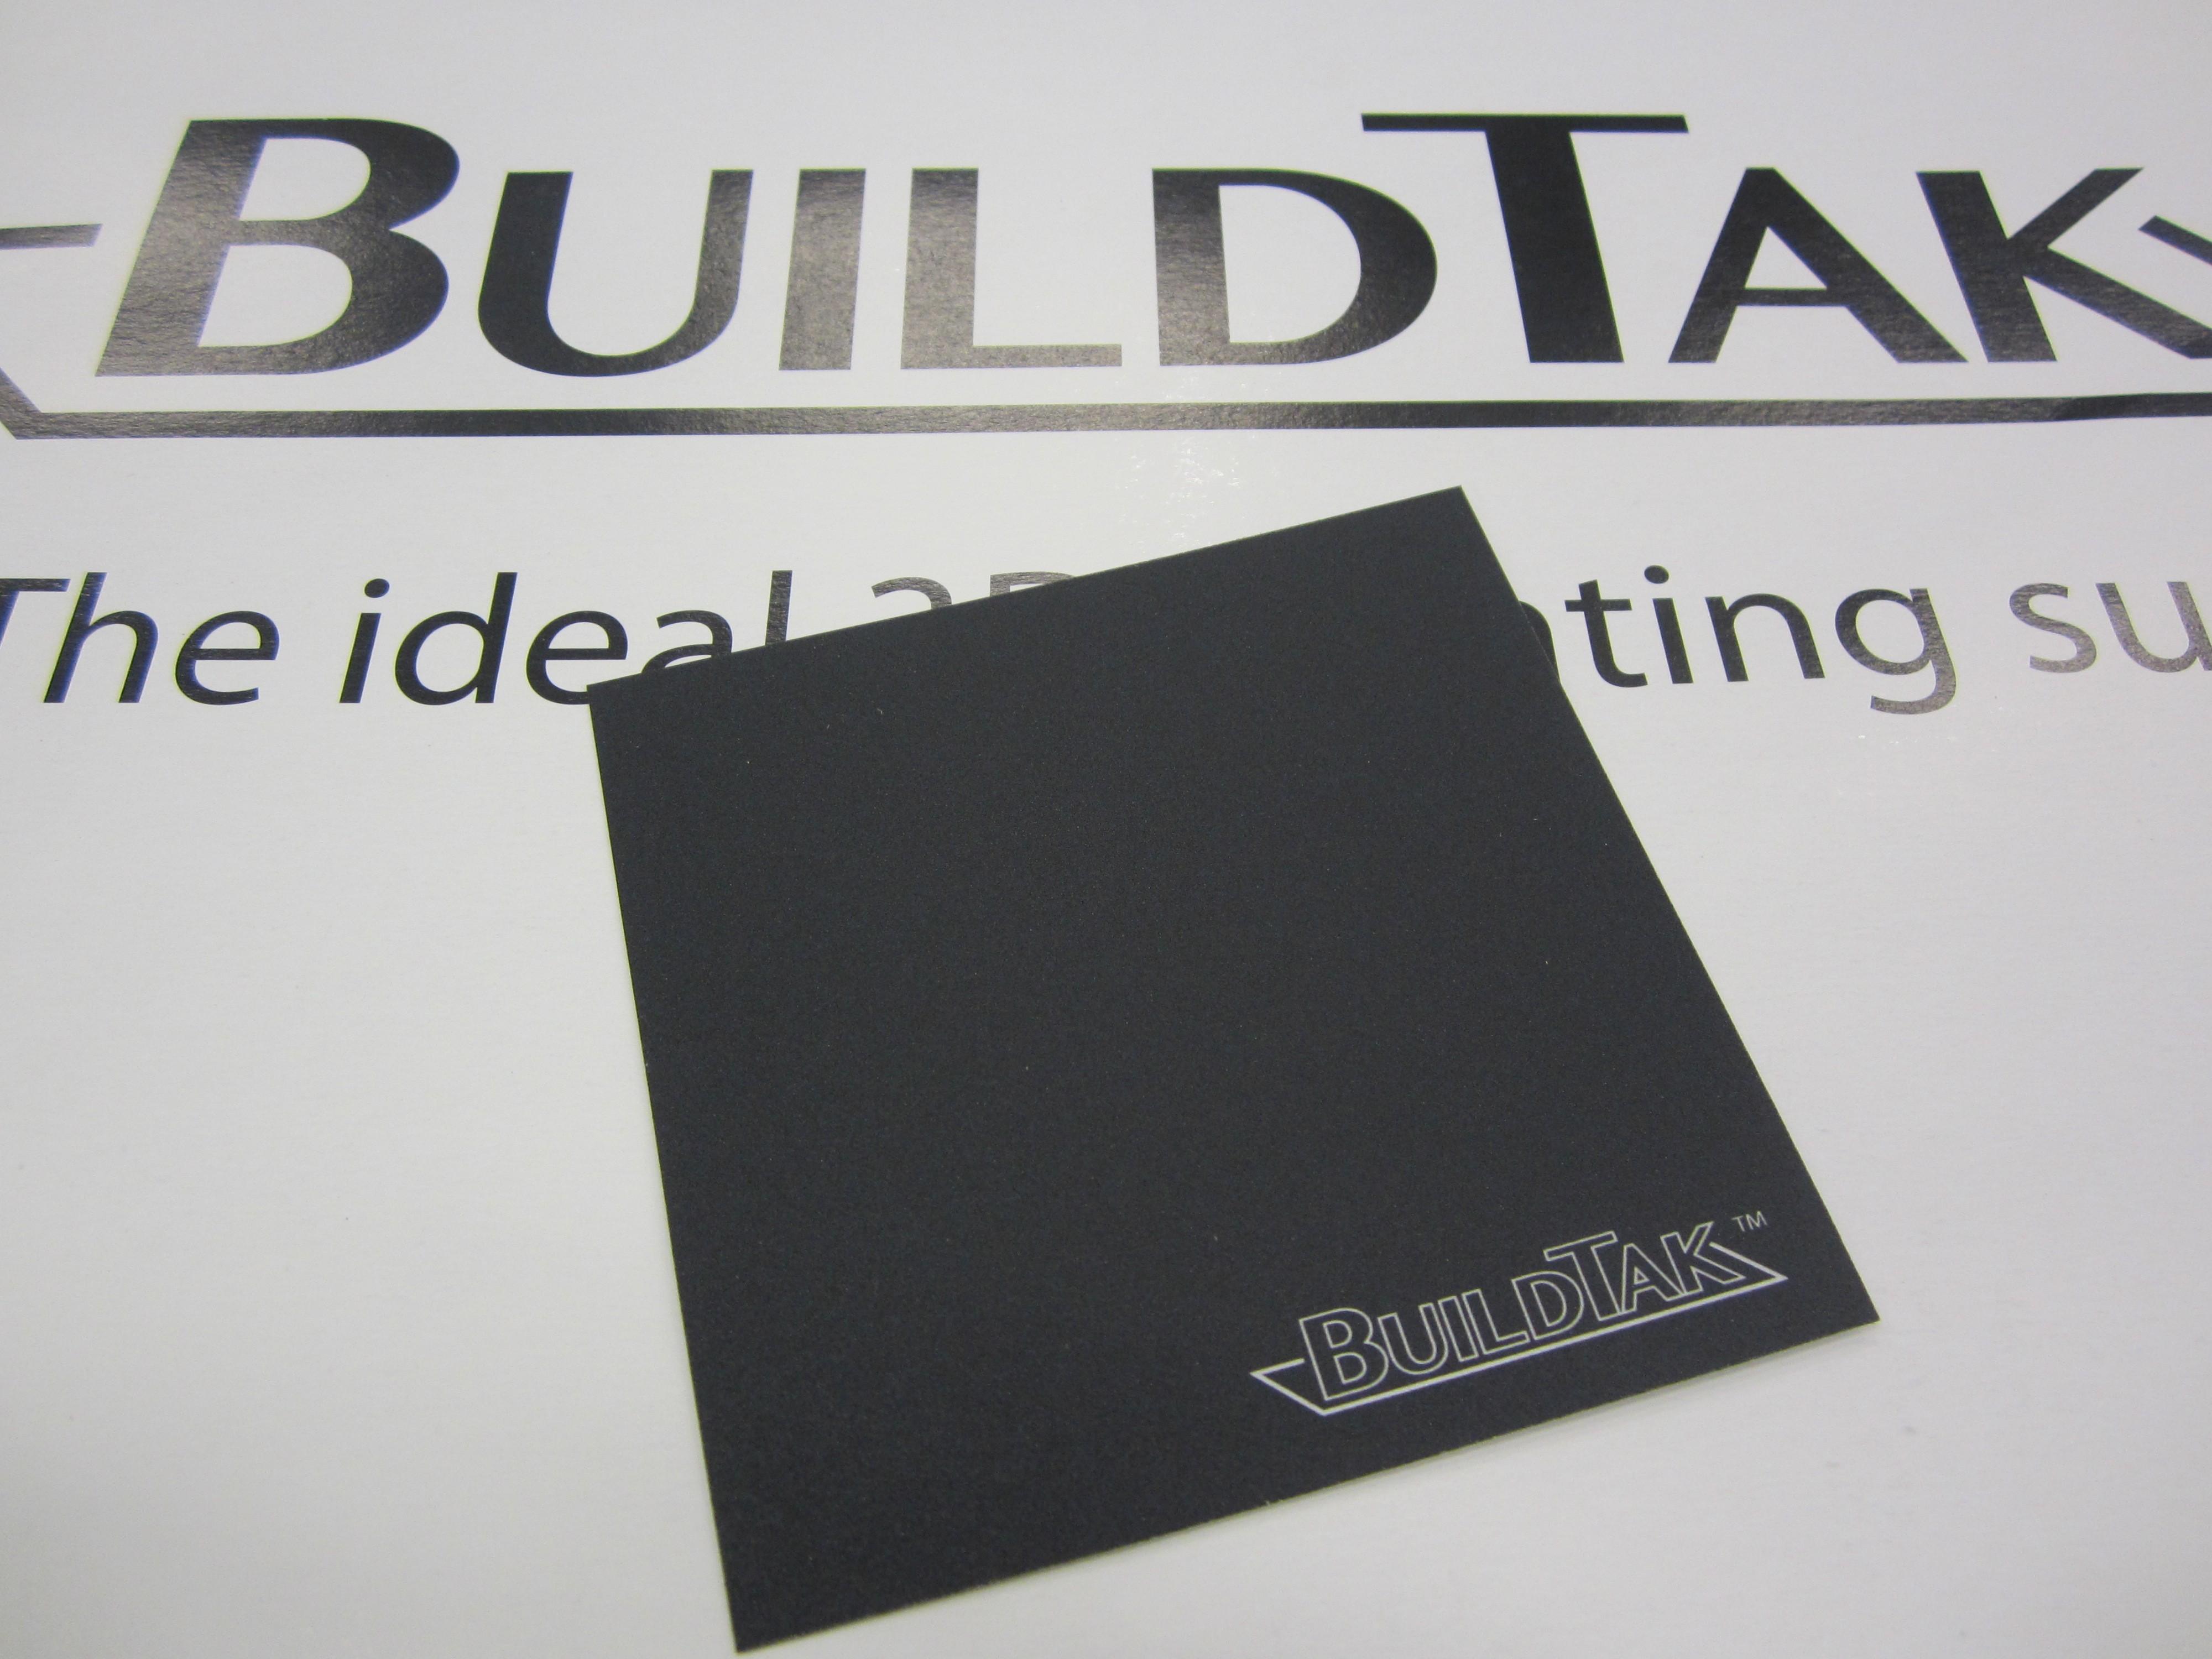 114x114 Buildtak